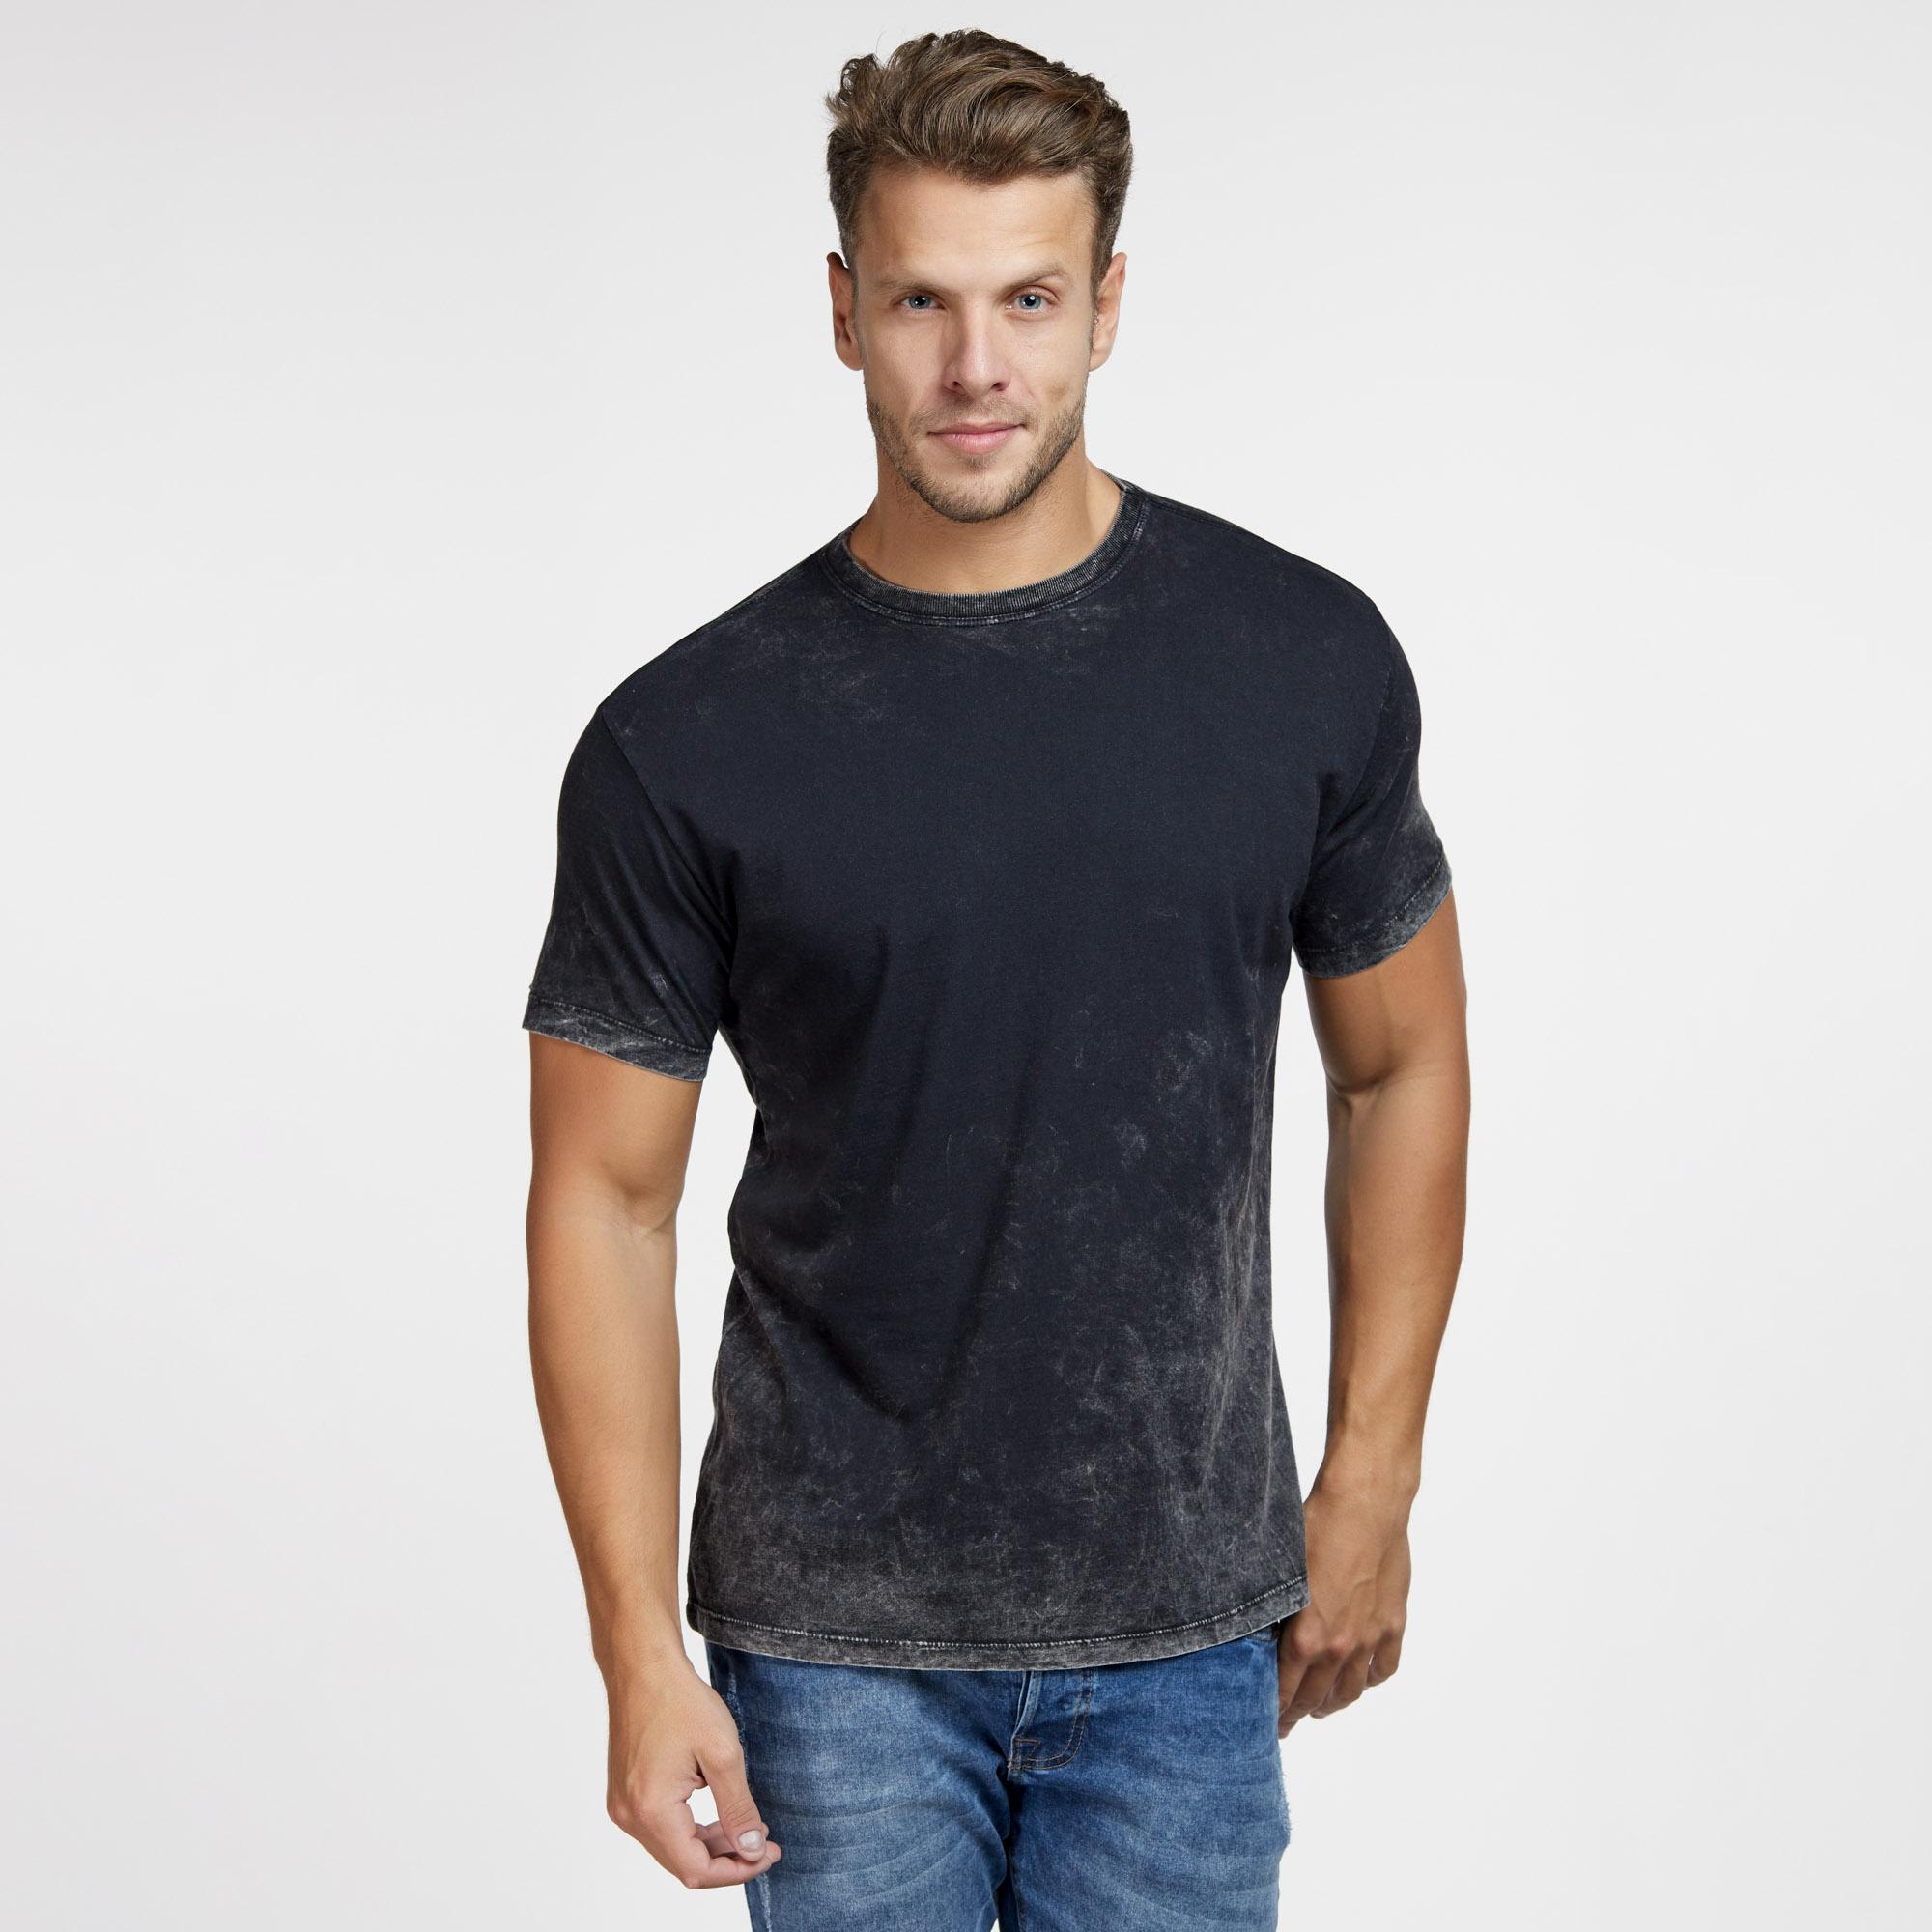 Camiseta Masculina Marmorizada do Avesso Preta